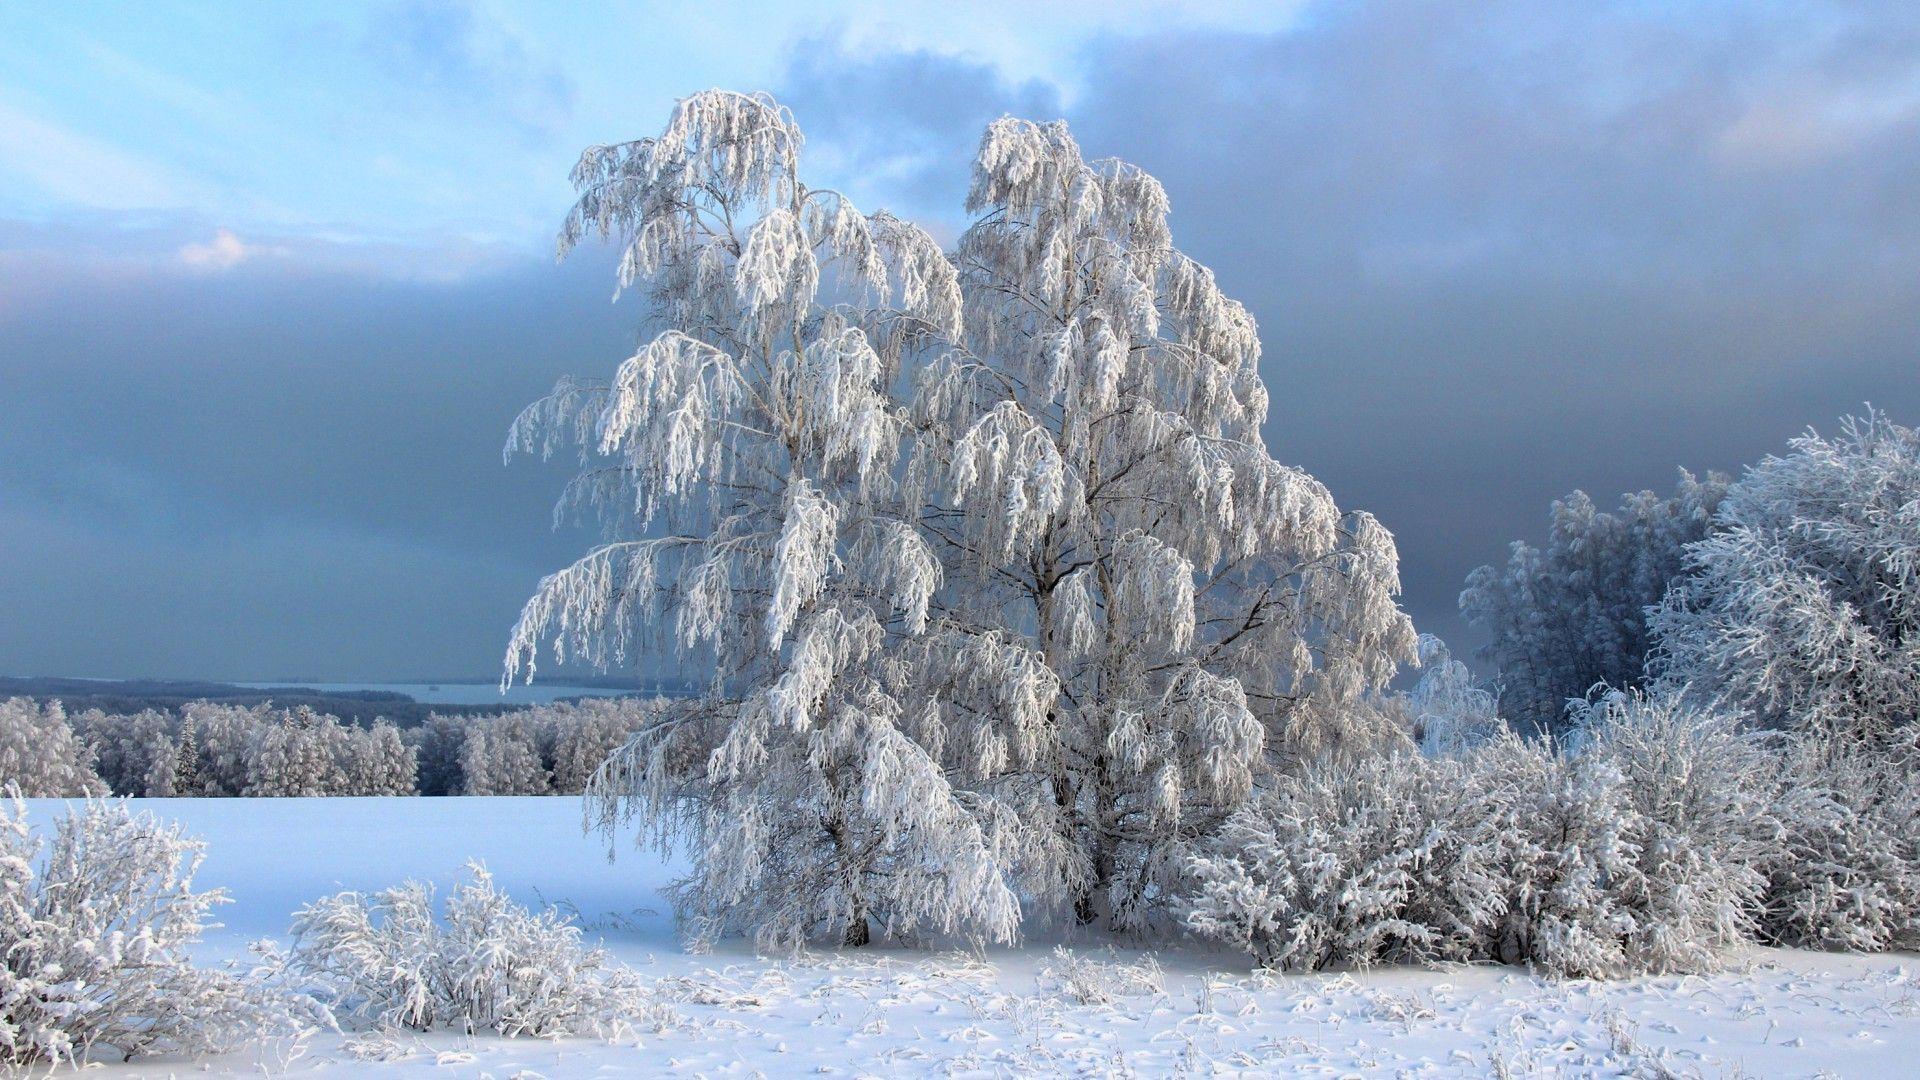 Snowy Landscape Photos